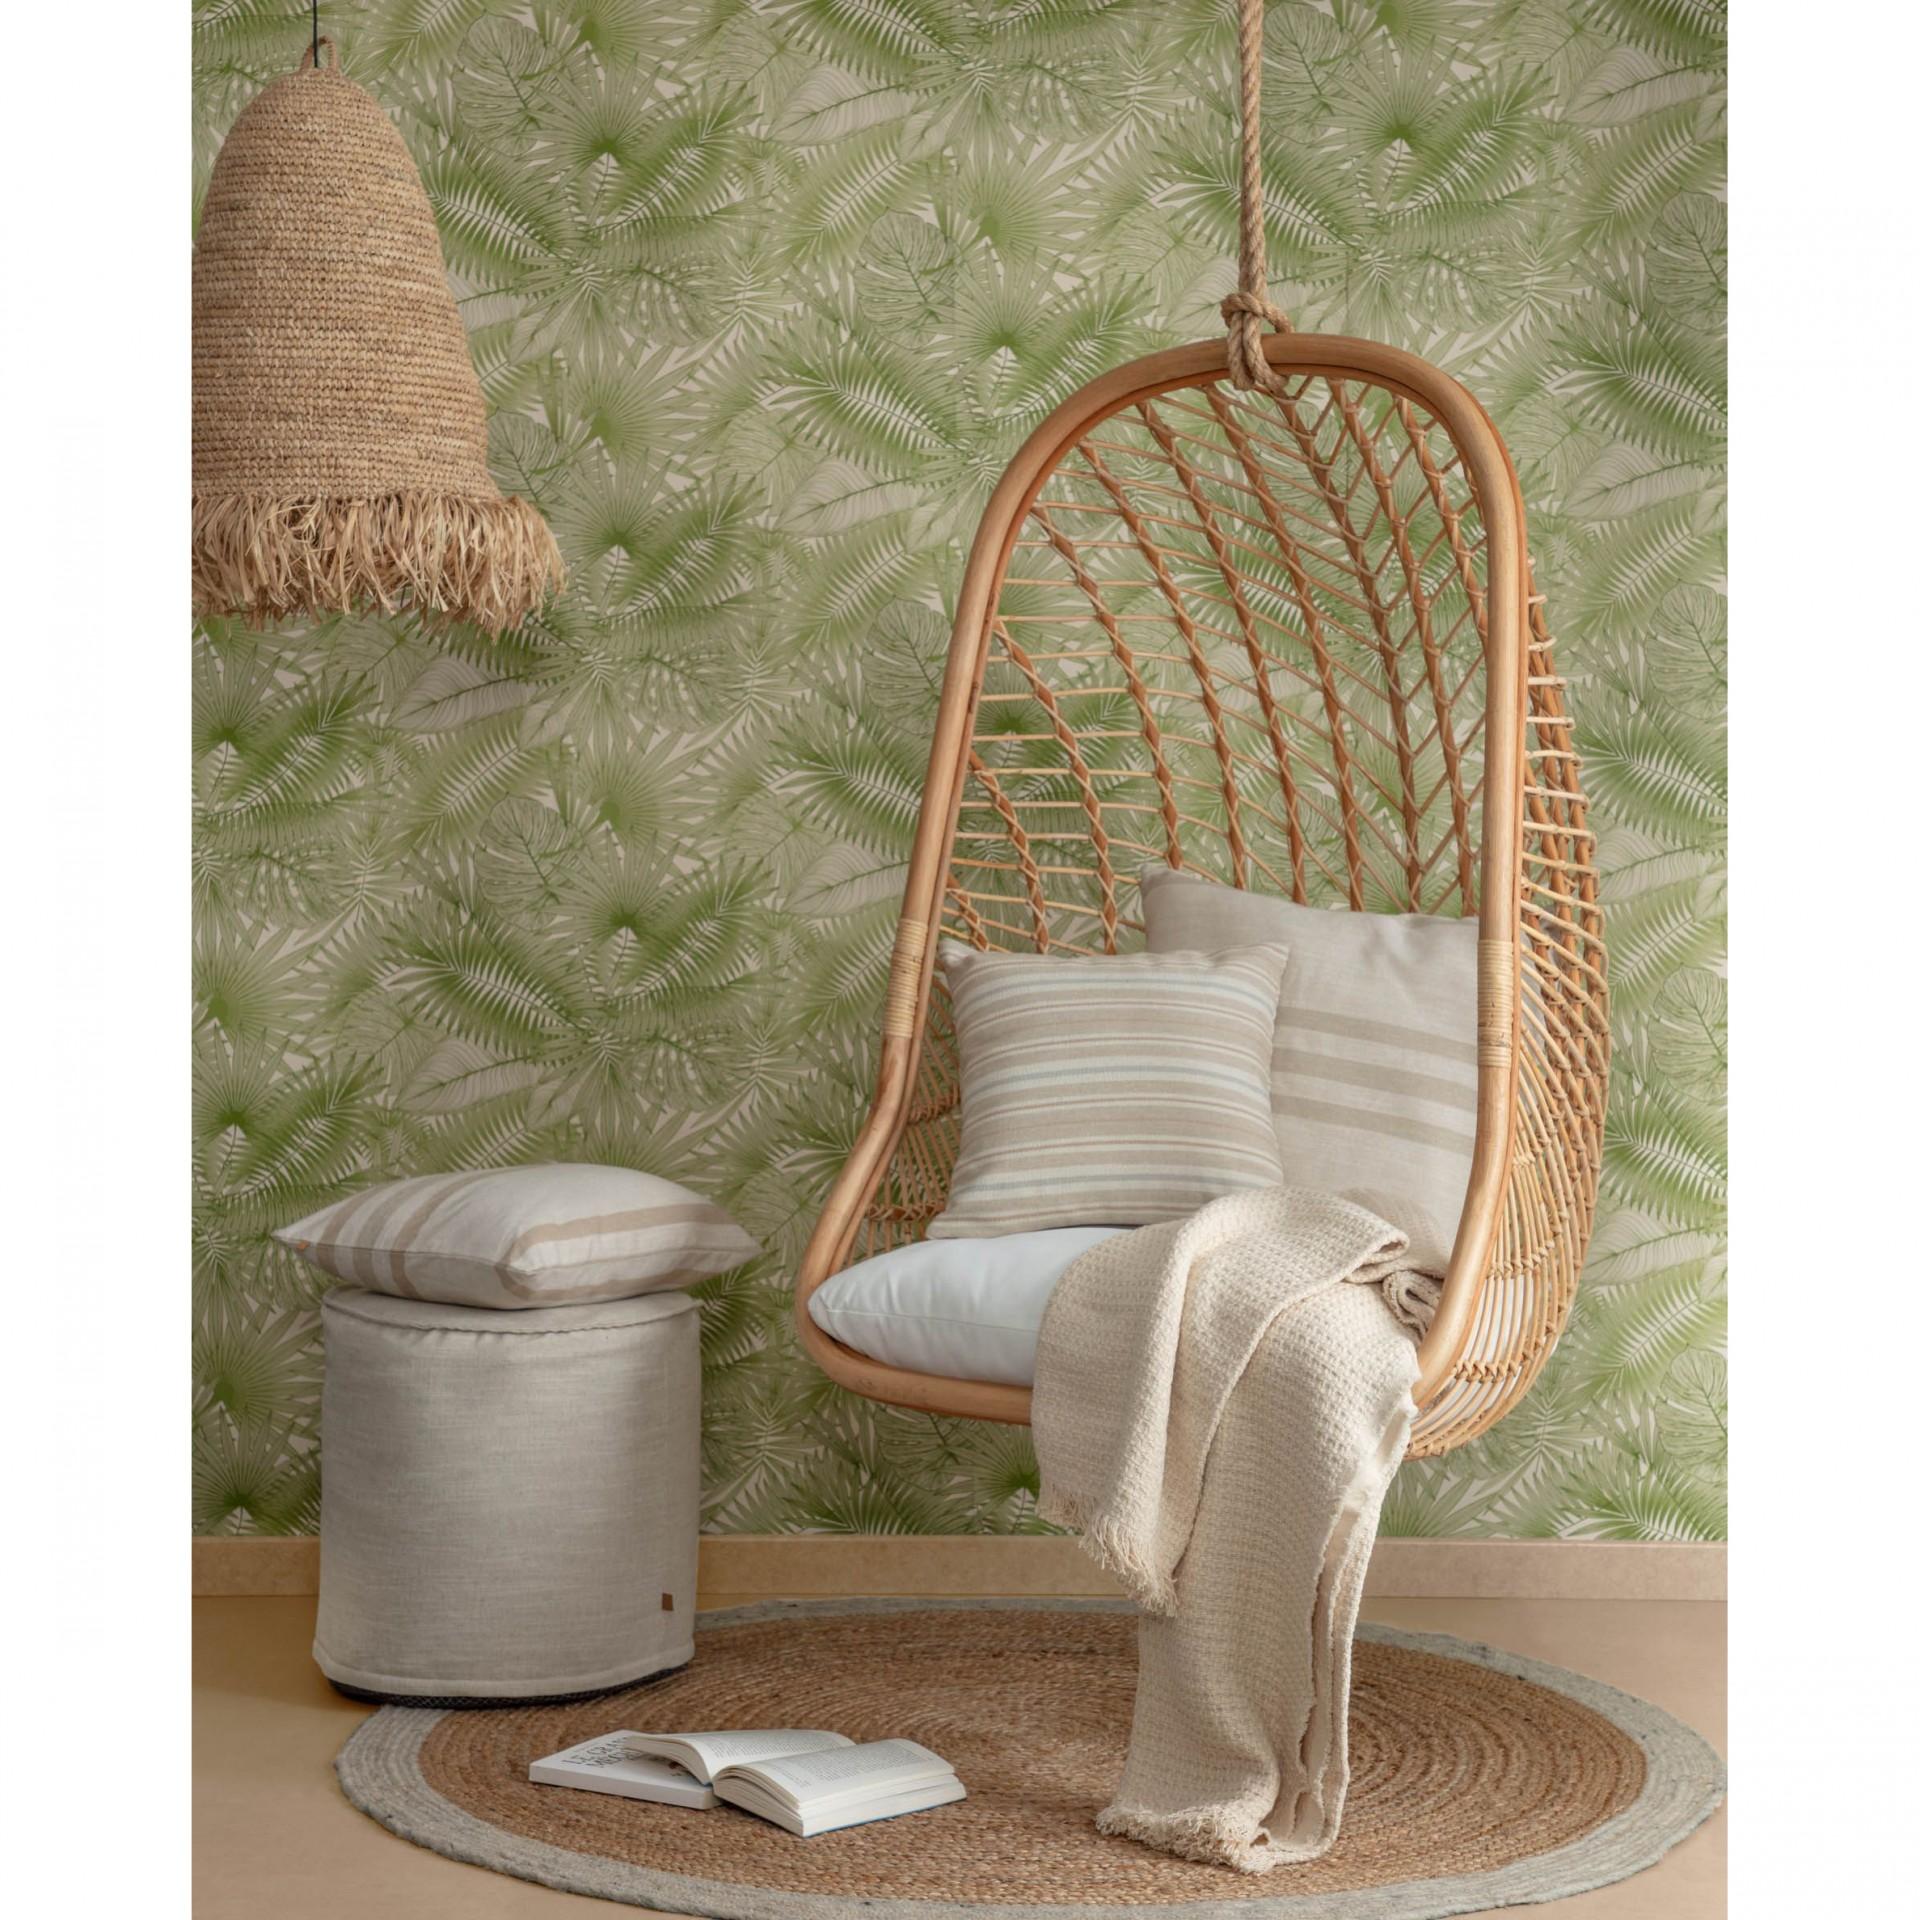 Cadeira suspensa Katerin, rattan natural, 85x72x124